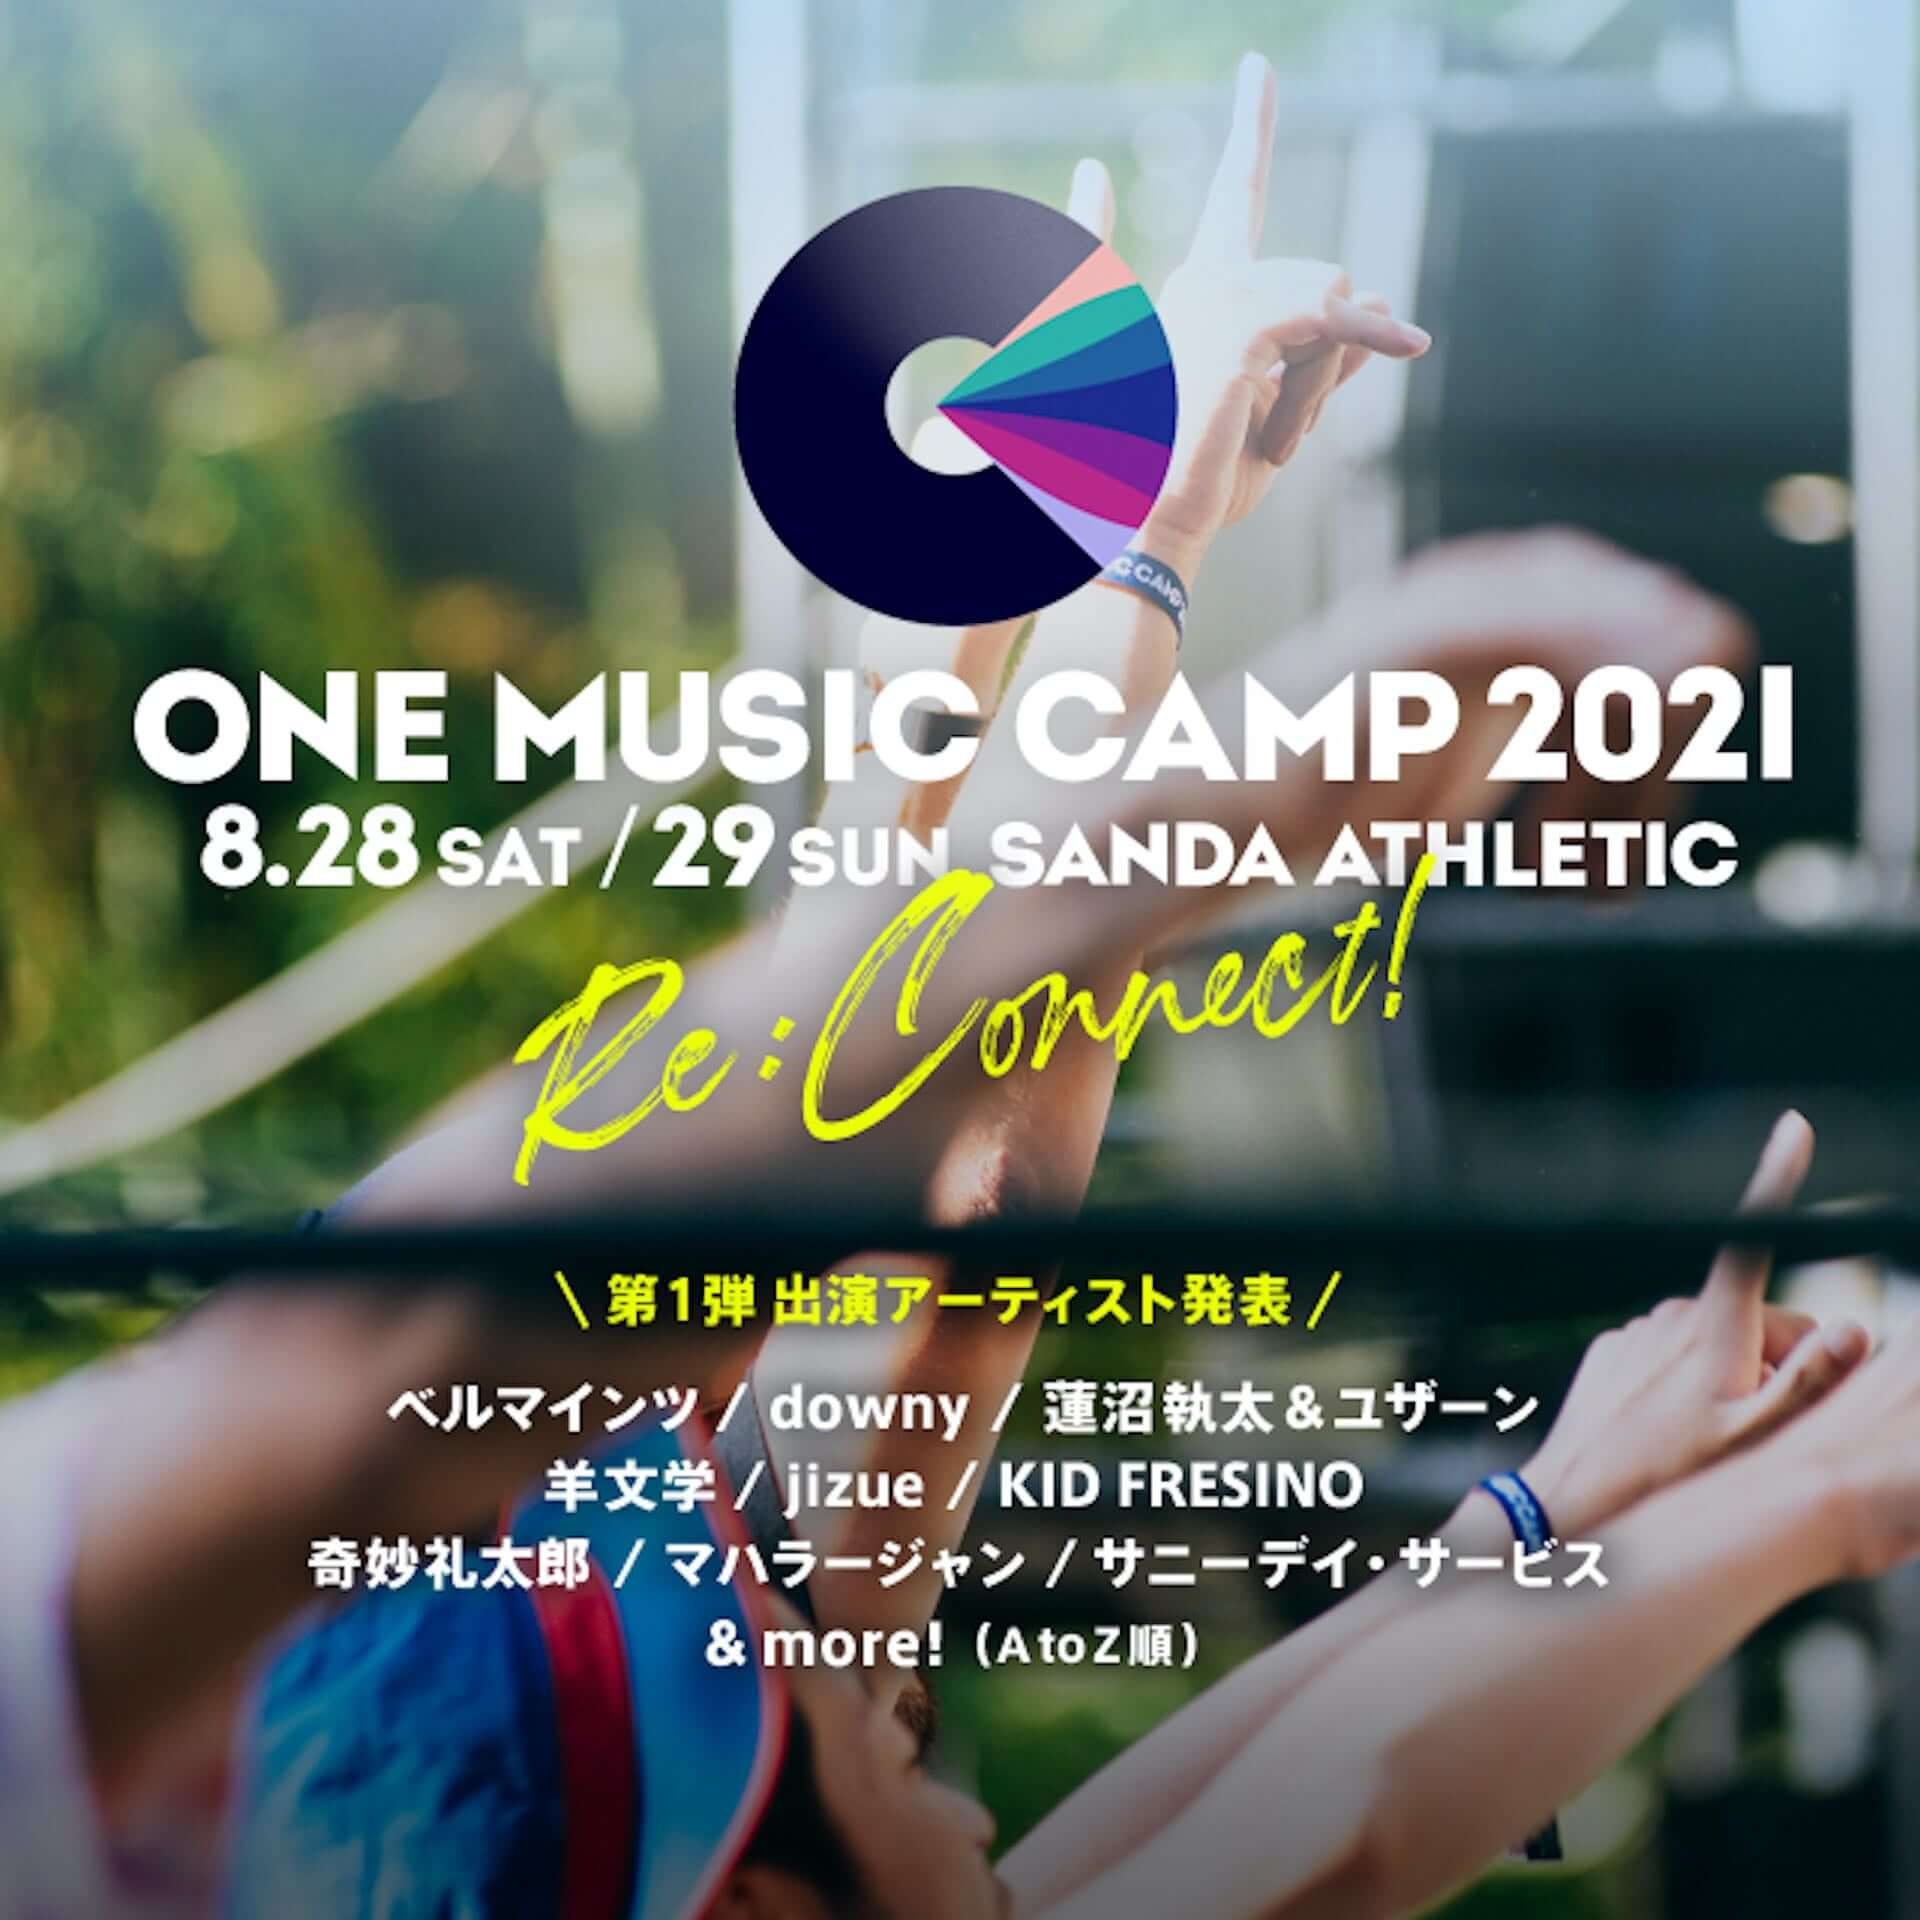 <ONE MUSIC CAMP 2021>にサニーデイ・サービス、羊文学、downy、KID FRESINOら9組が出演決定!チケットも販売開始 music210326_onemusiccamp_1-1920x1920